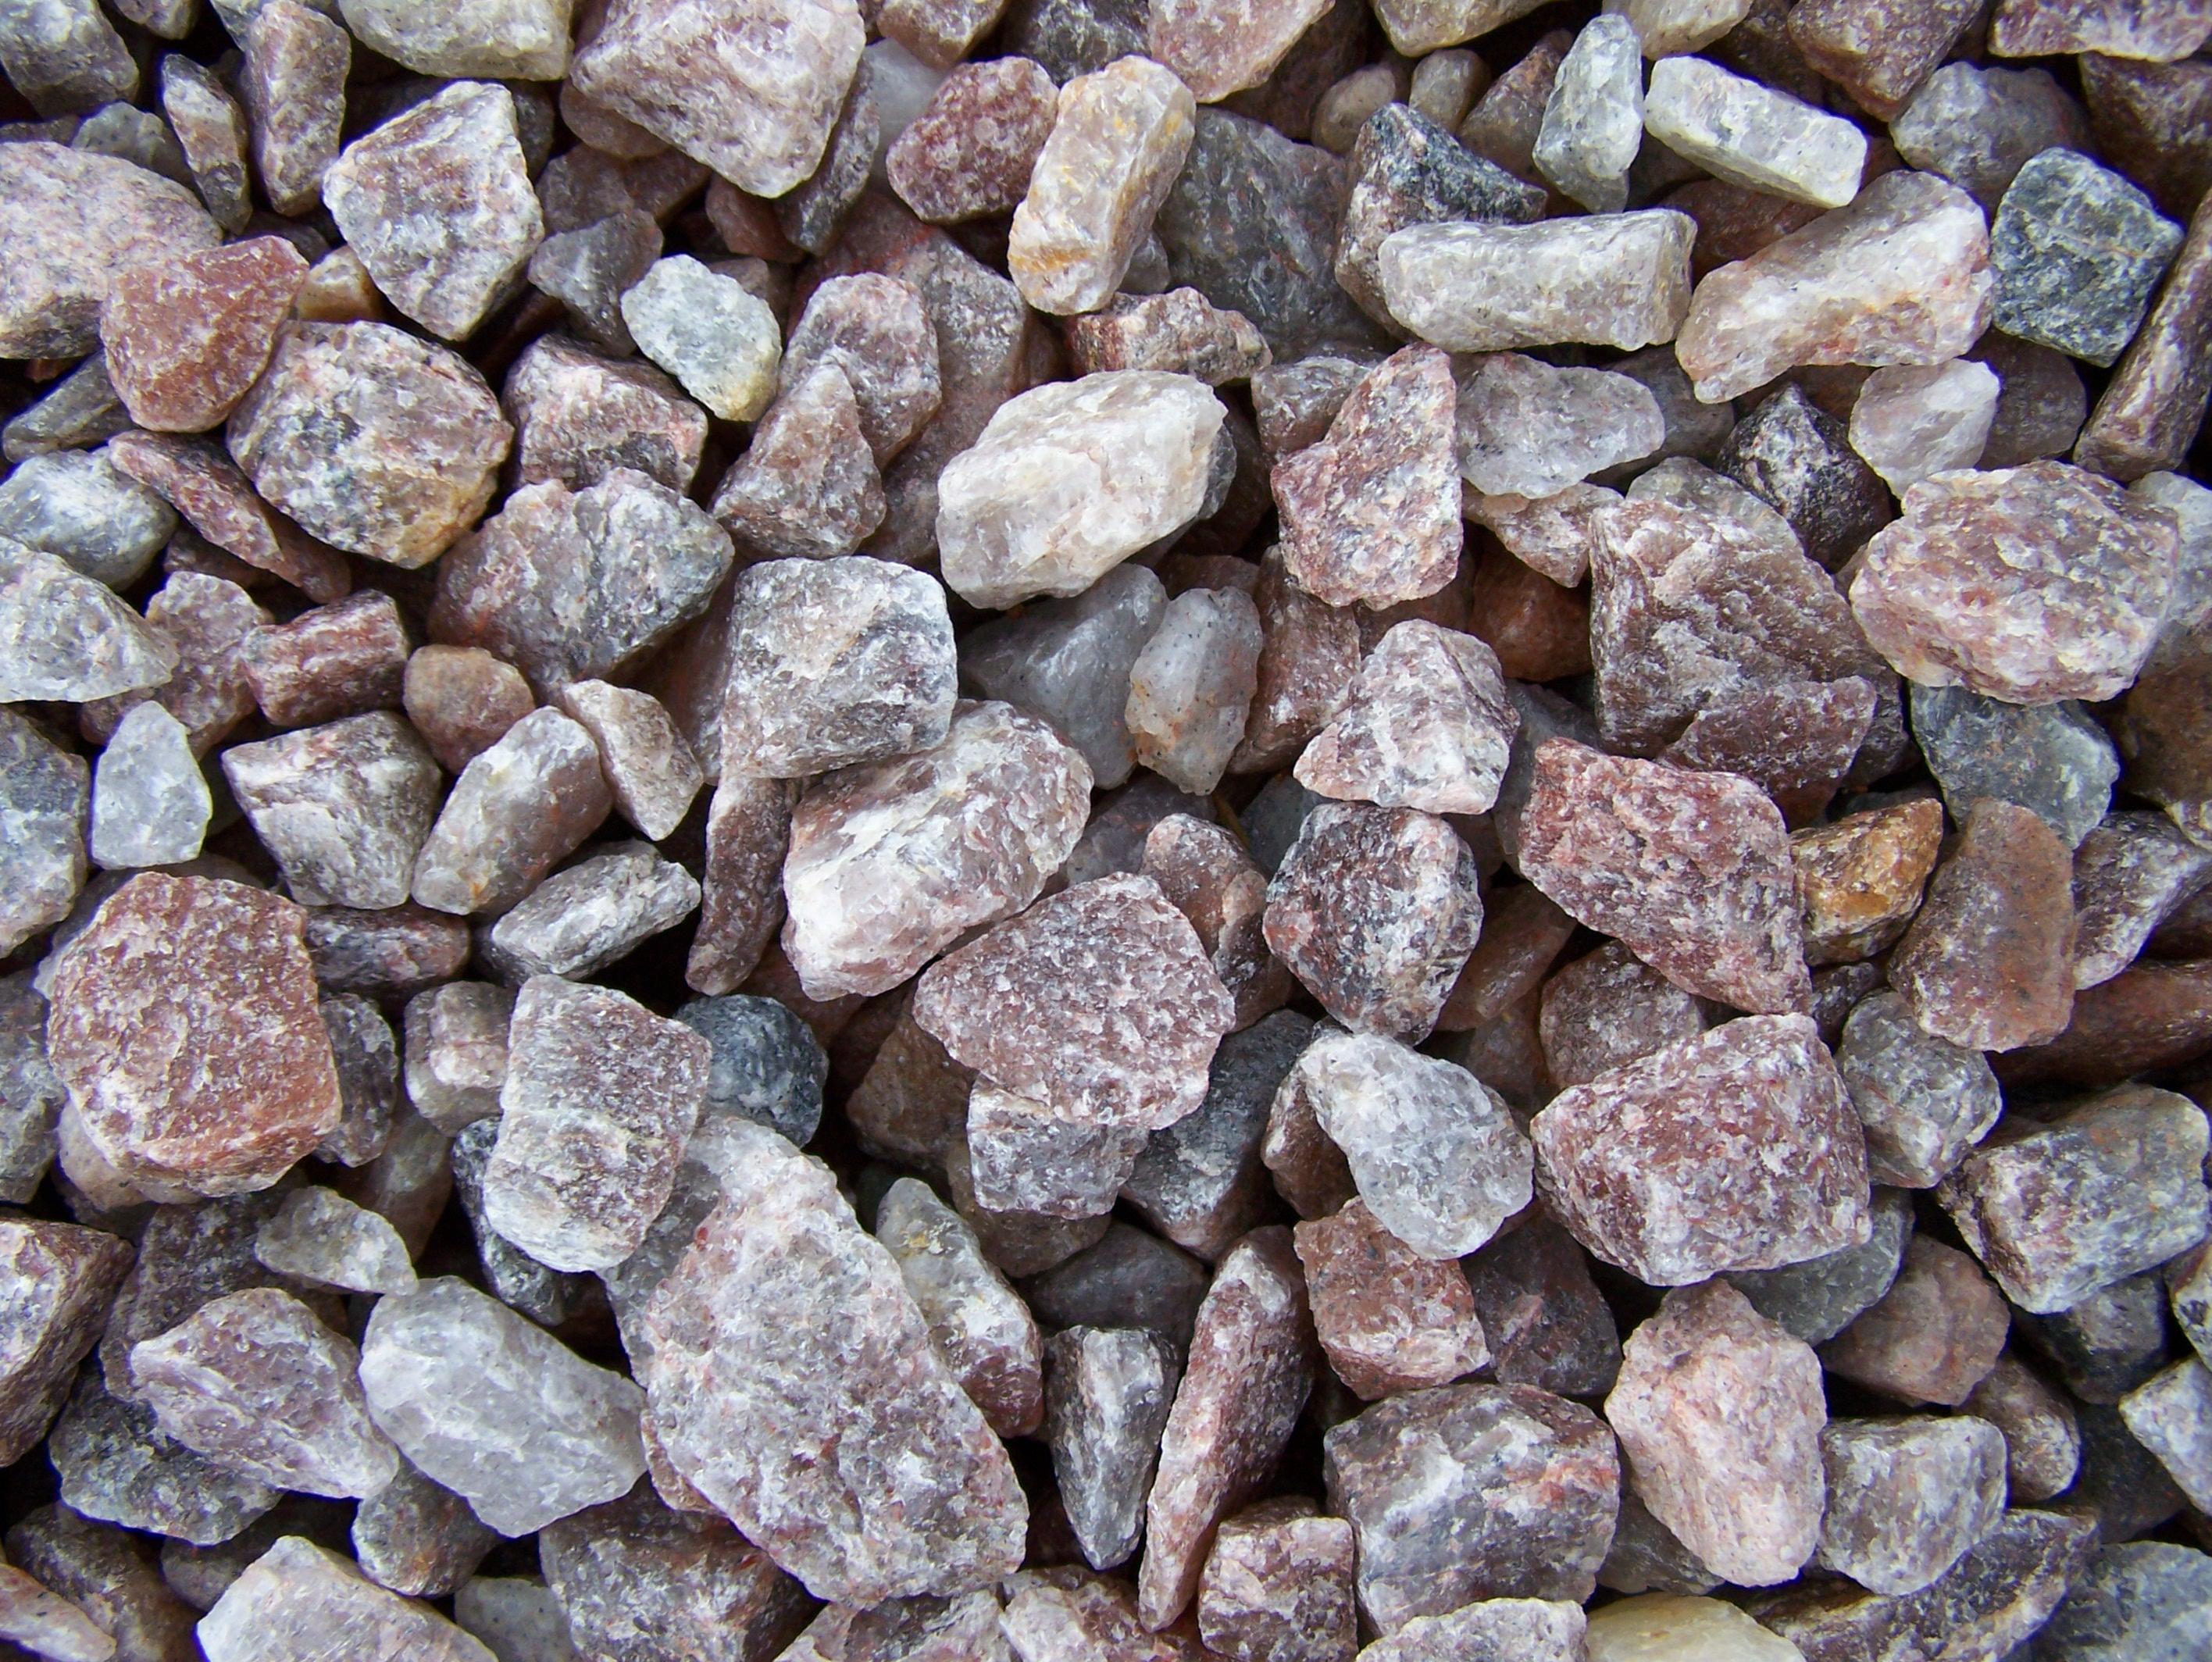 Gold coast landscaping inc pink quartz for Landscaping rocks quartz